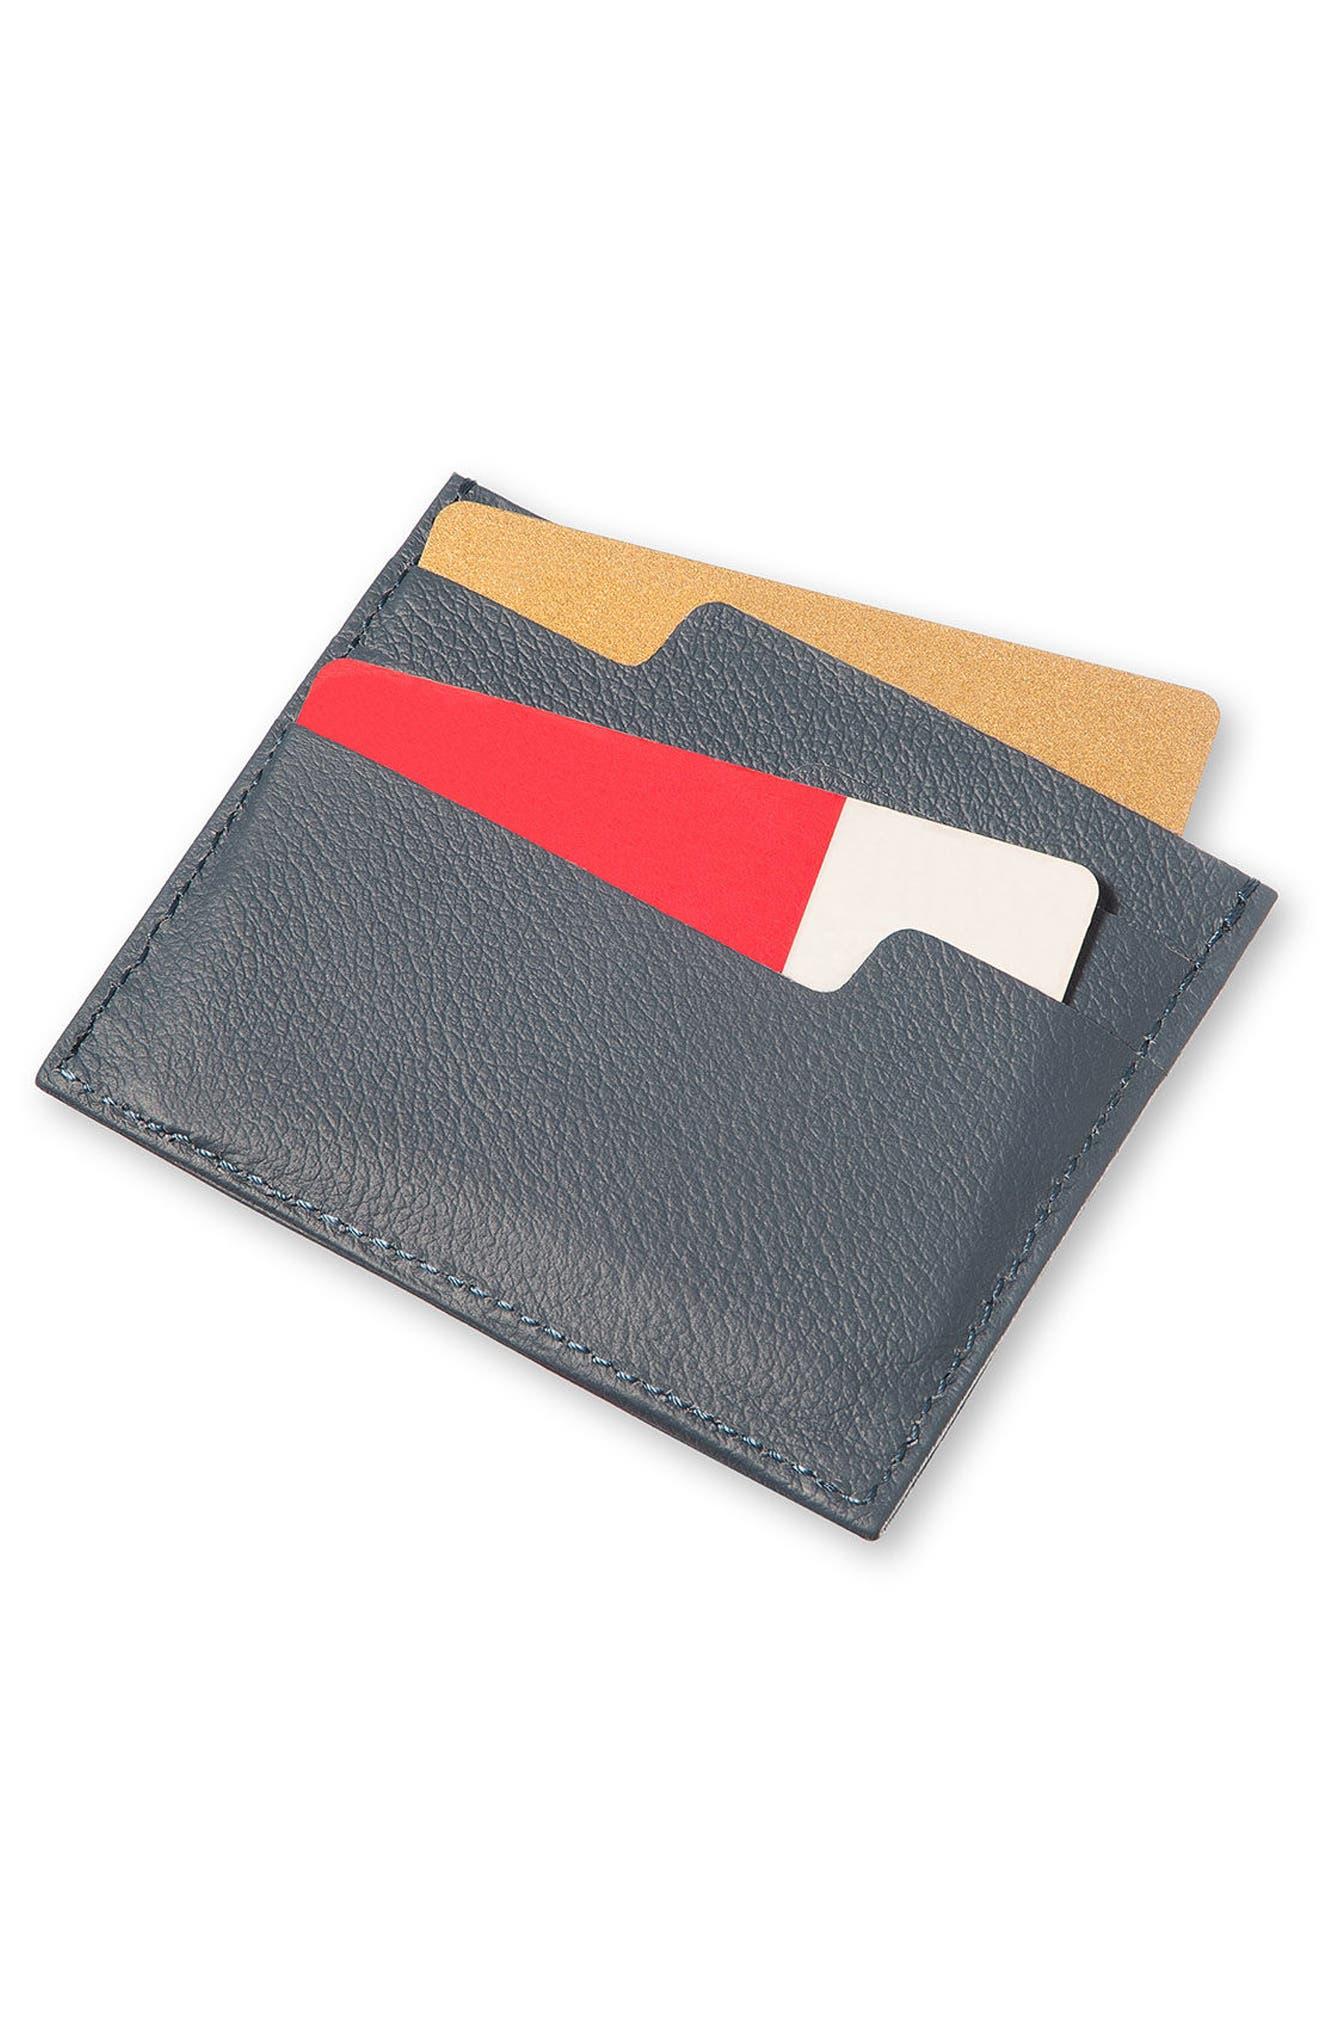 Moleskin Lineage Leather Card Case,                             Alternate thumbnail 4, color,                             AVIO BLUE